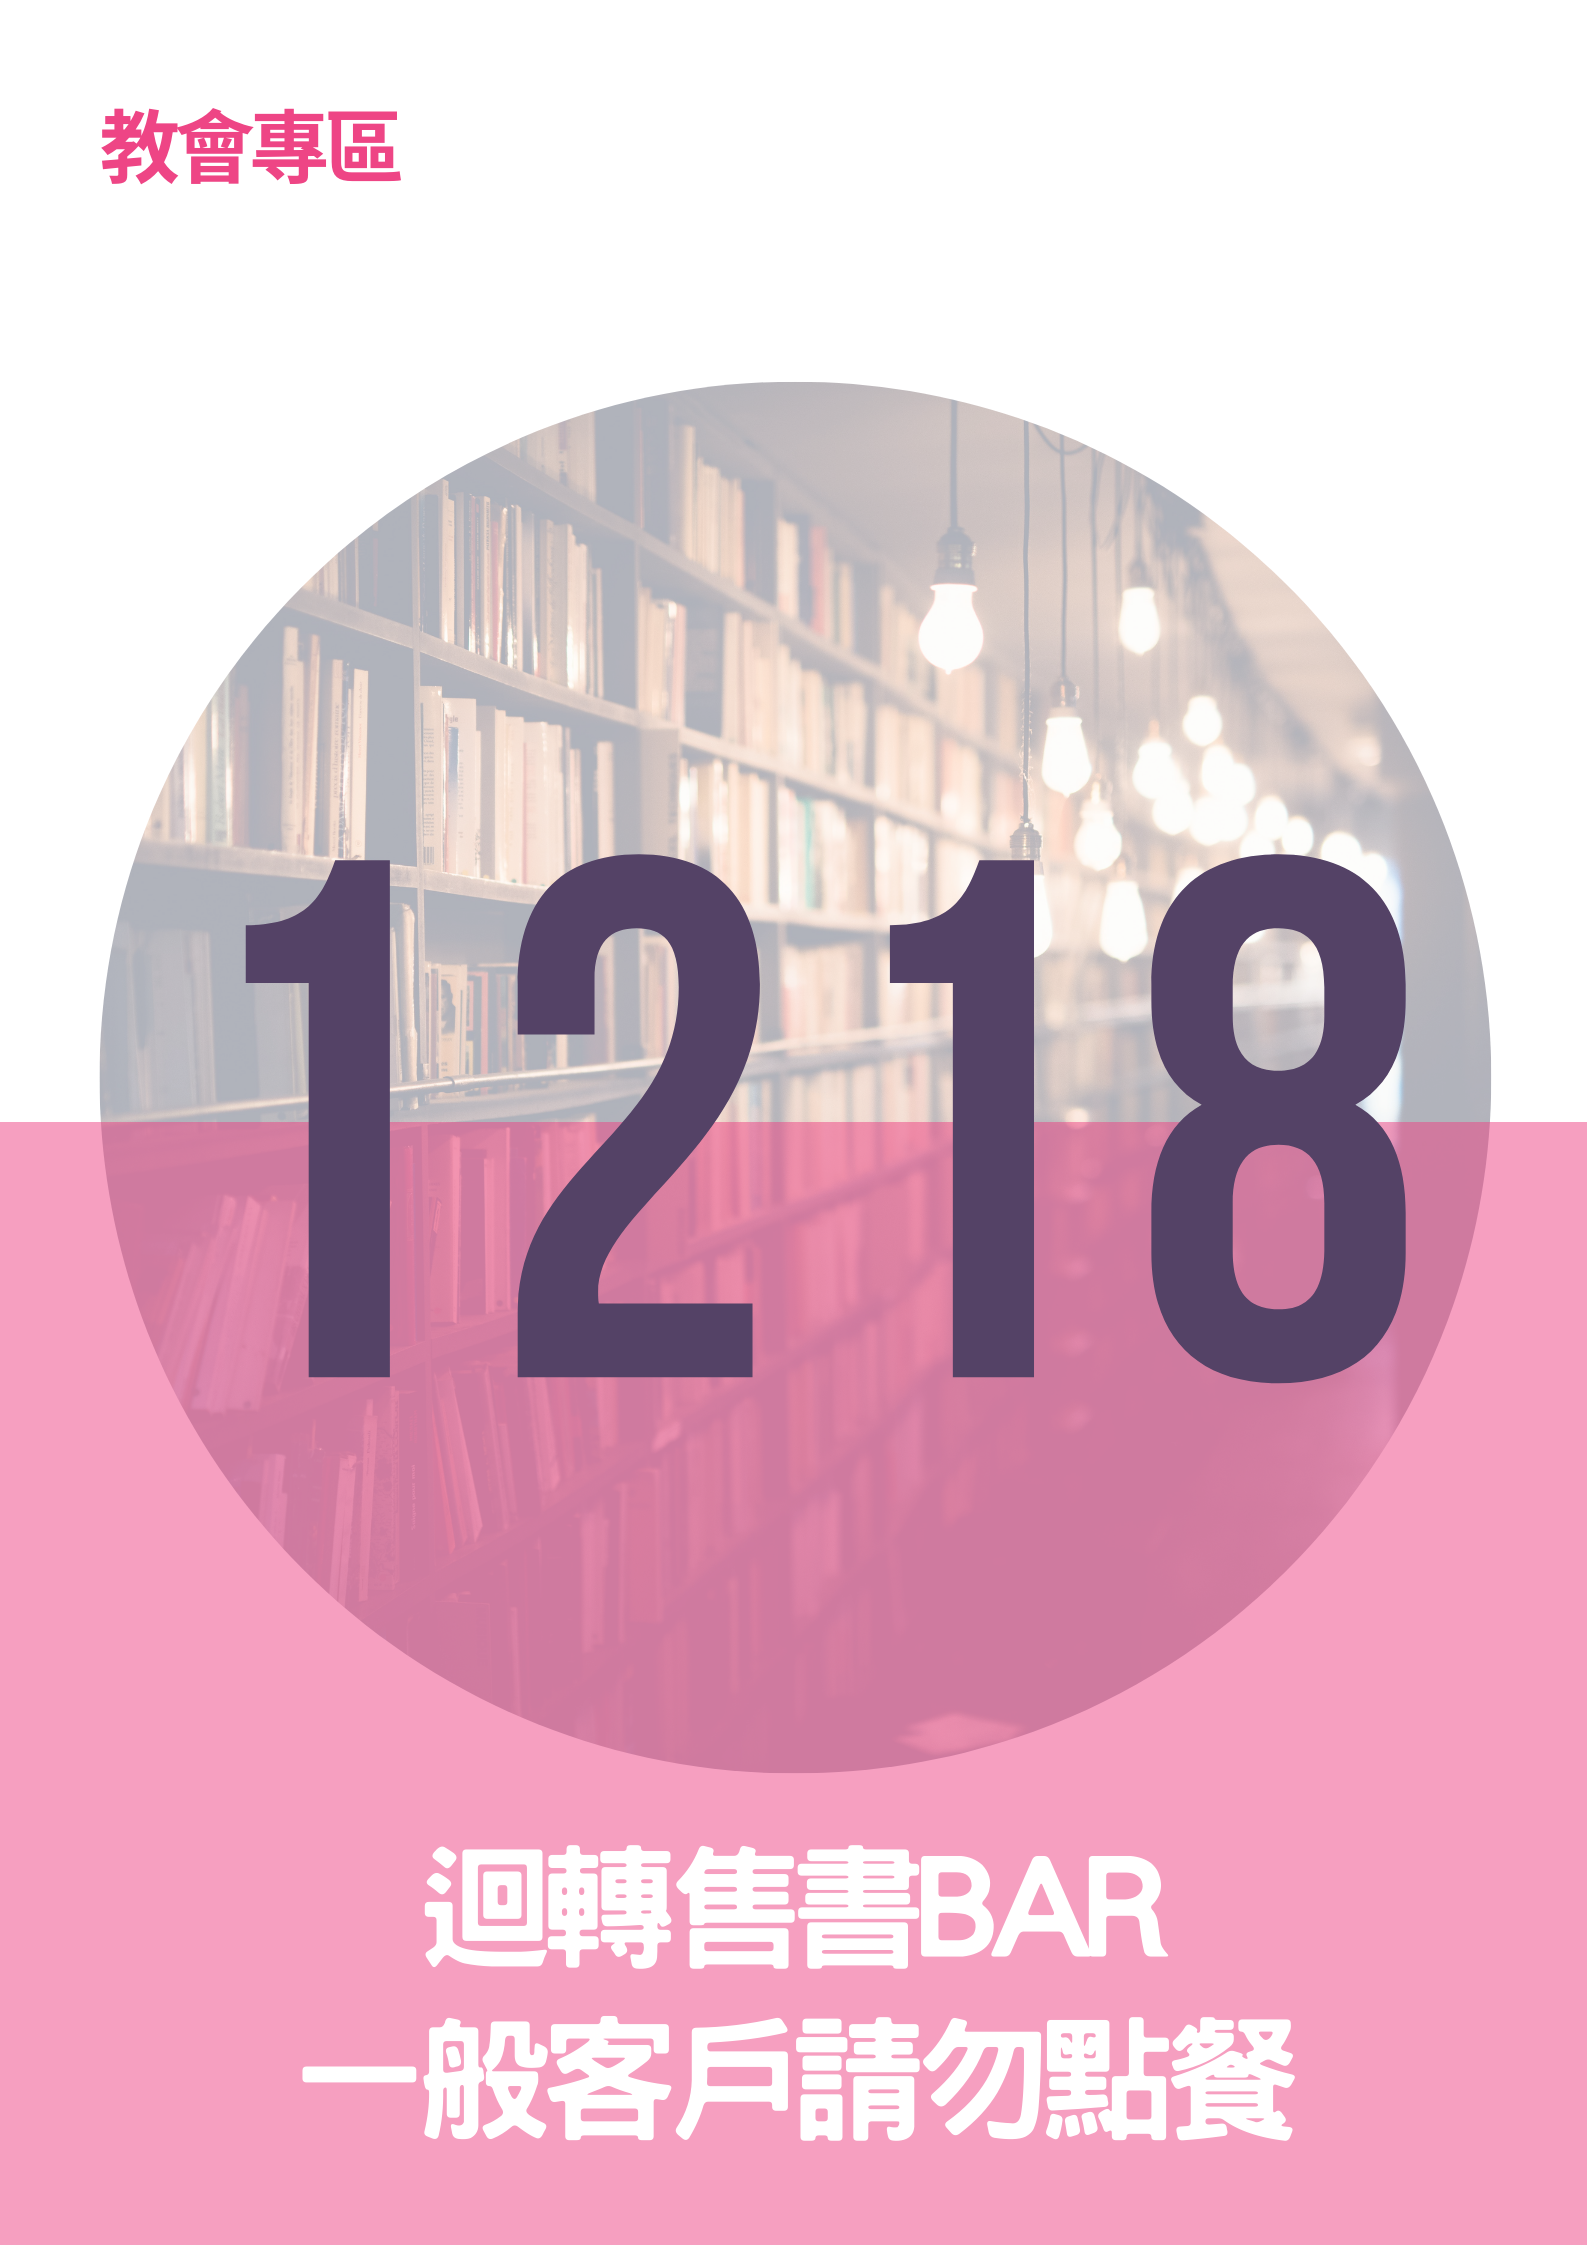 17296193